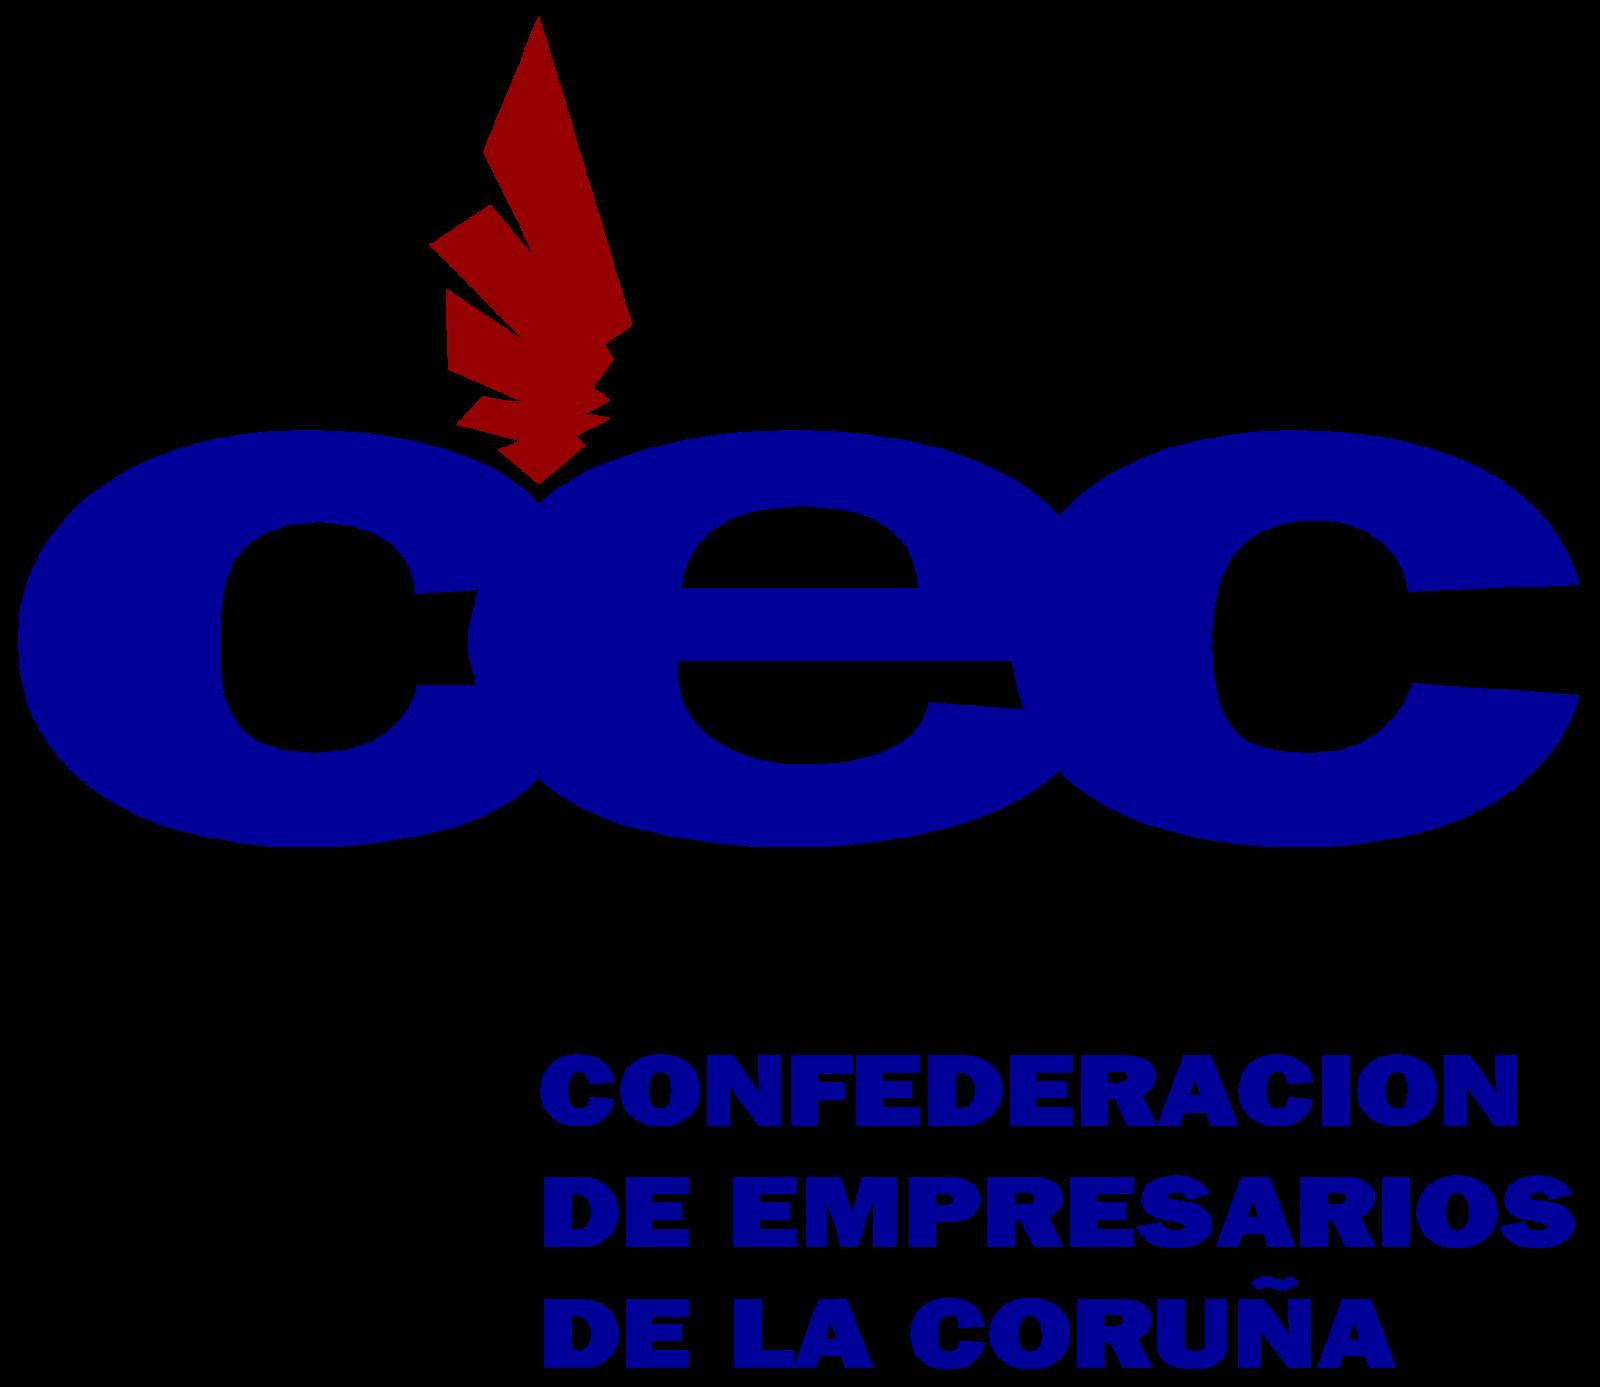 www.cec.es